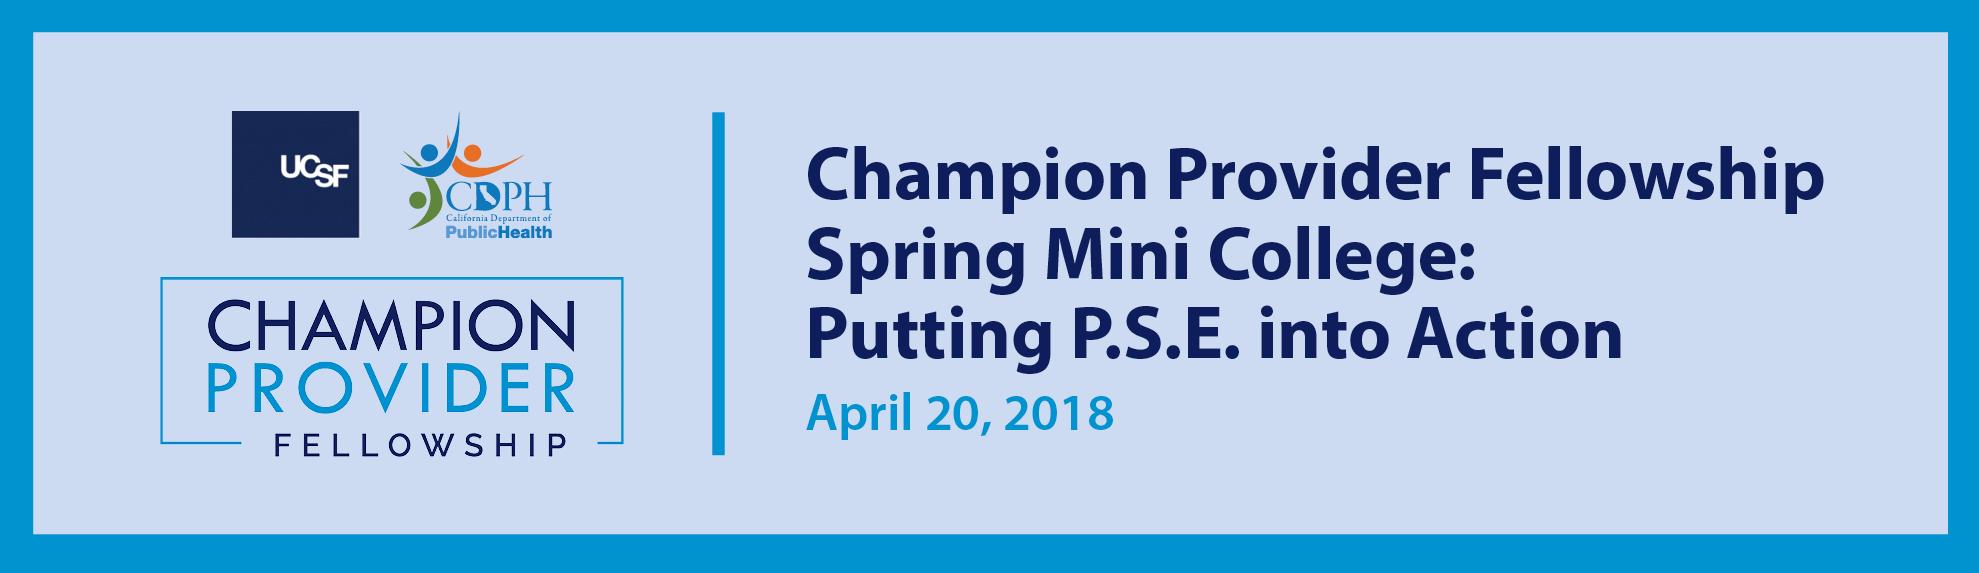 UCSF-Champion Provider Fellowship Spring Mini Coll